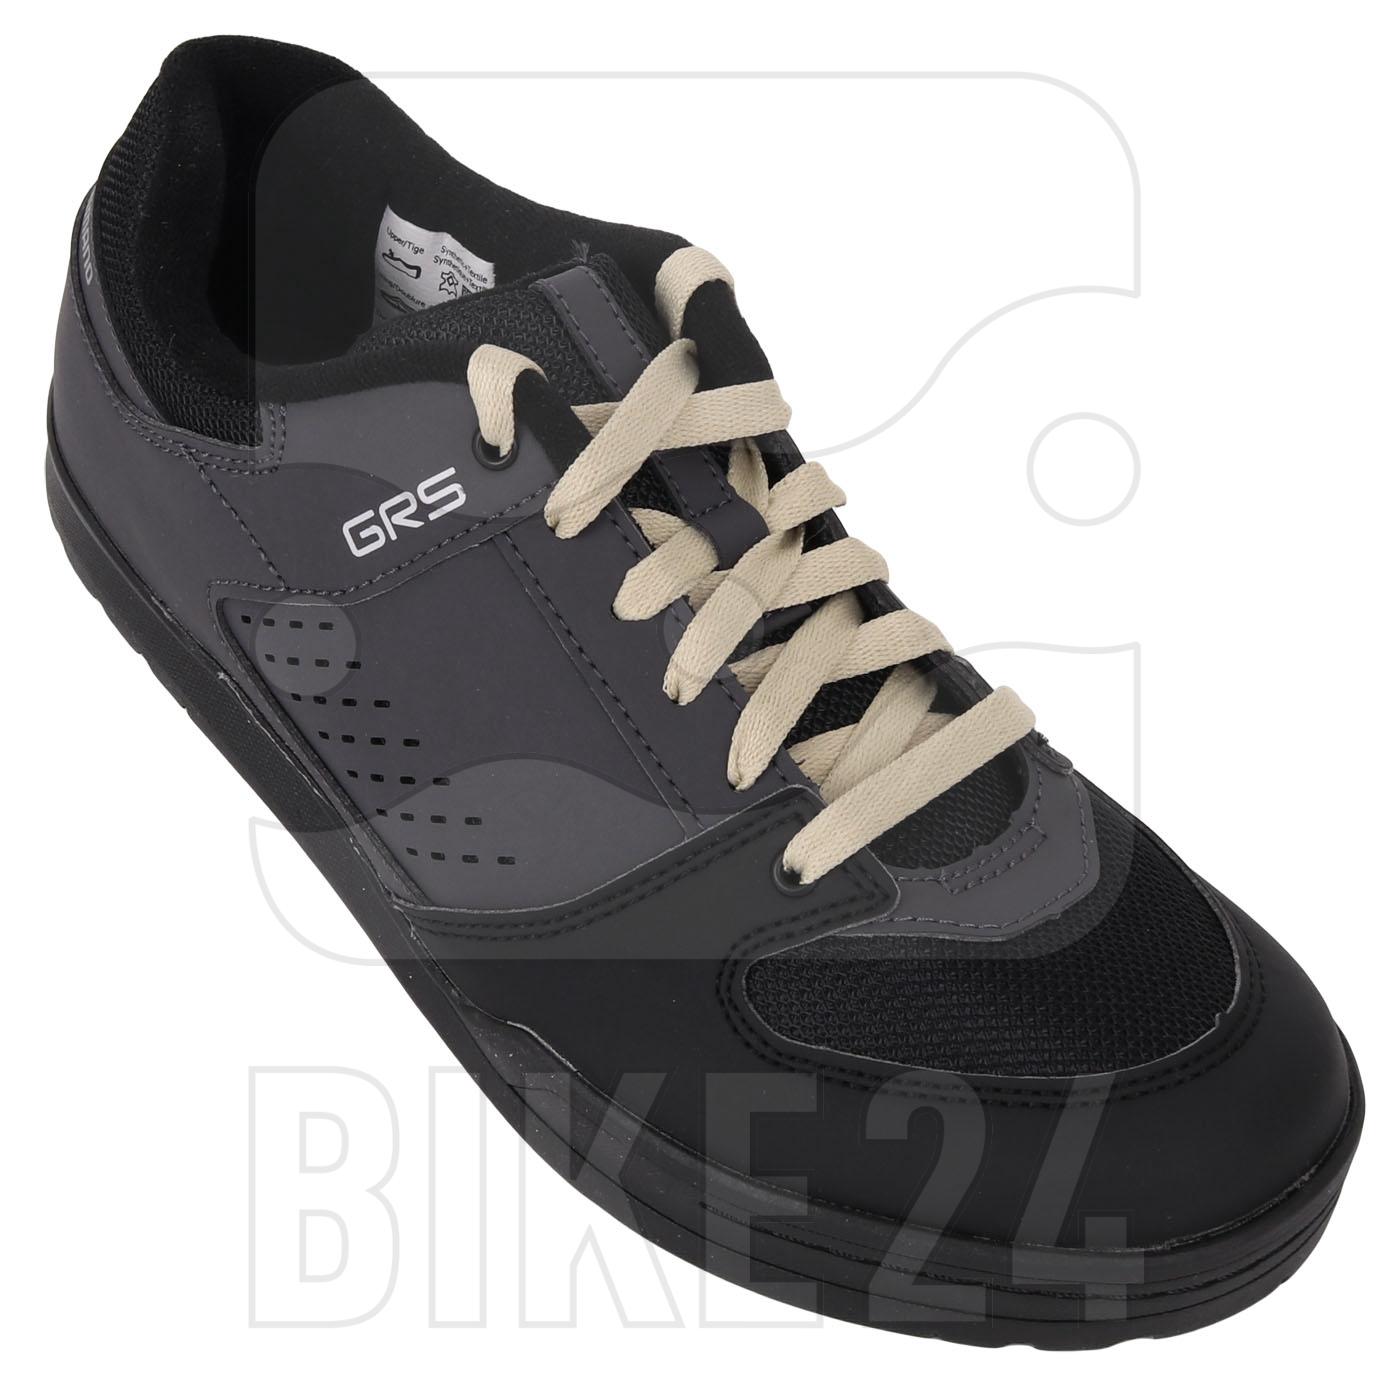 Shimano SH-GR500 MTB Shoe - grey